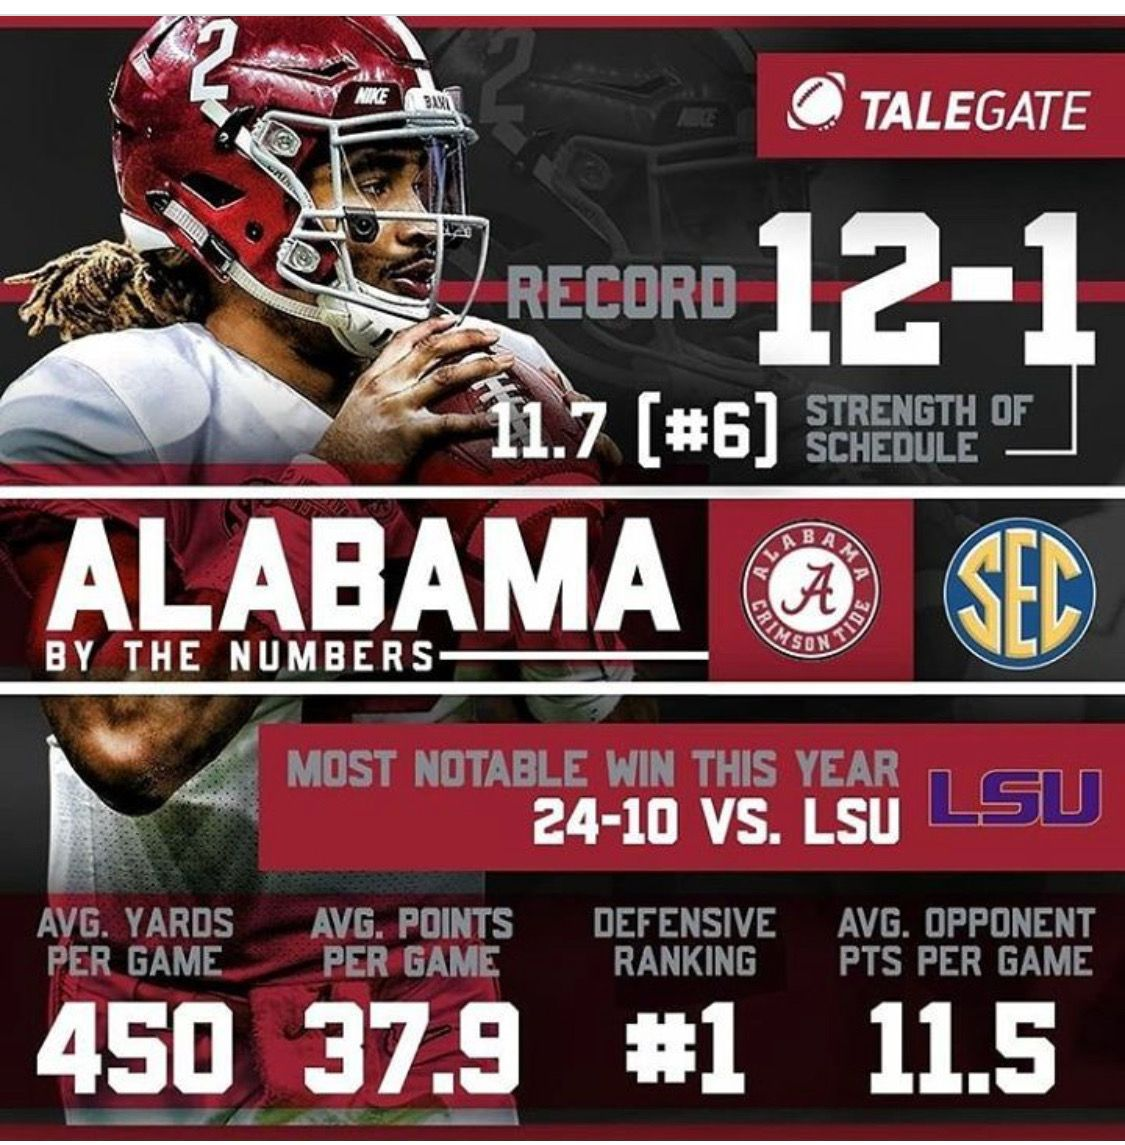 2018 National Champions The Alabama Crimson Tide